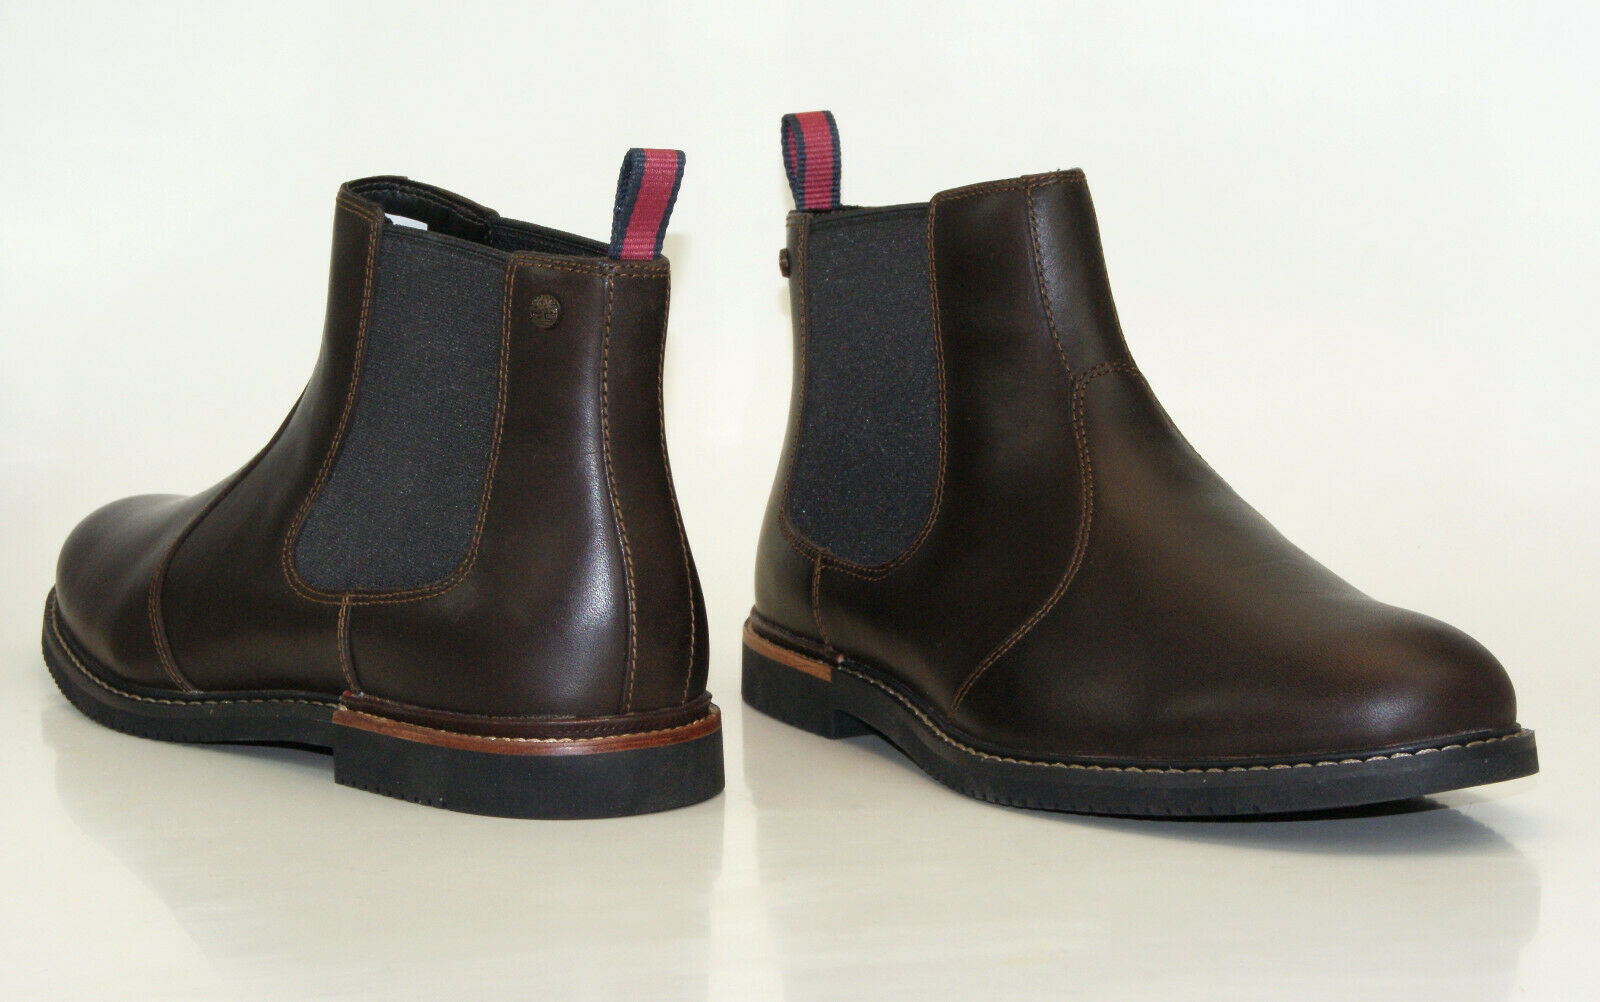 Timberland Brook Park Chelsea Boots Stiefeletten Herren Schuhe Stiefel 5516A